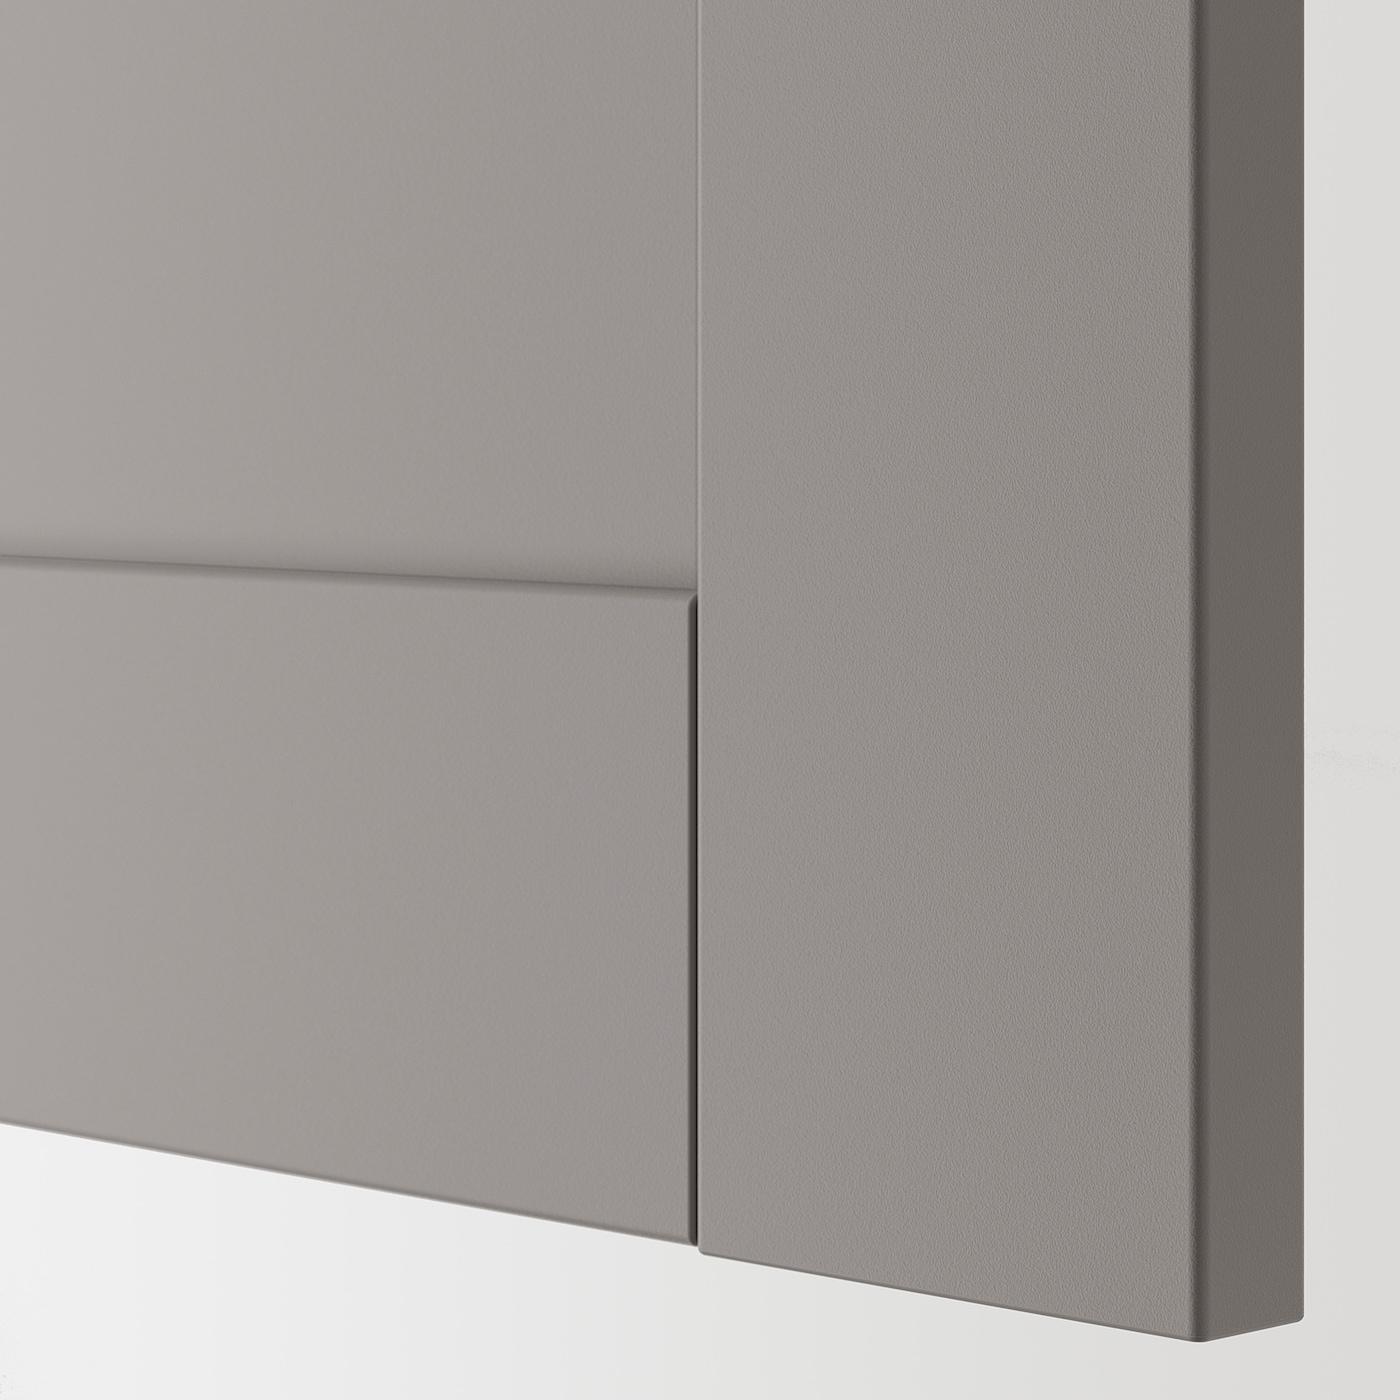 ENHET Wall storage combination, anthracite/grey frame, 60x32x180 cm